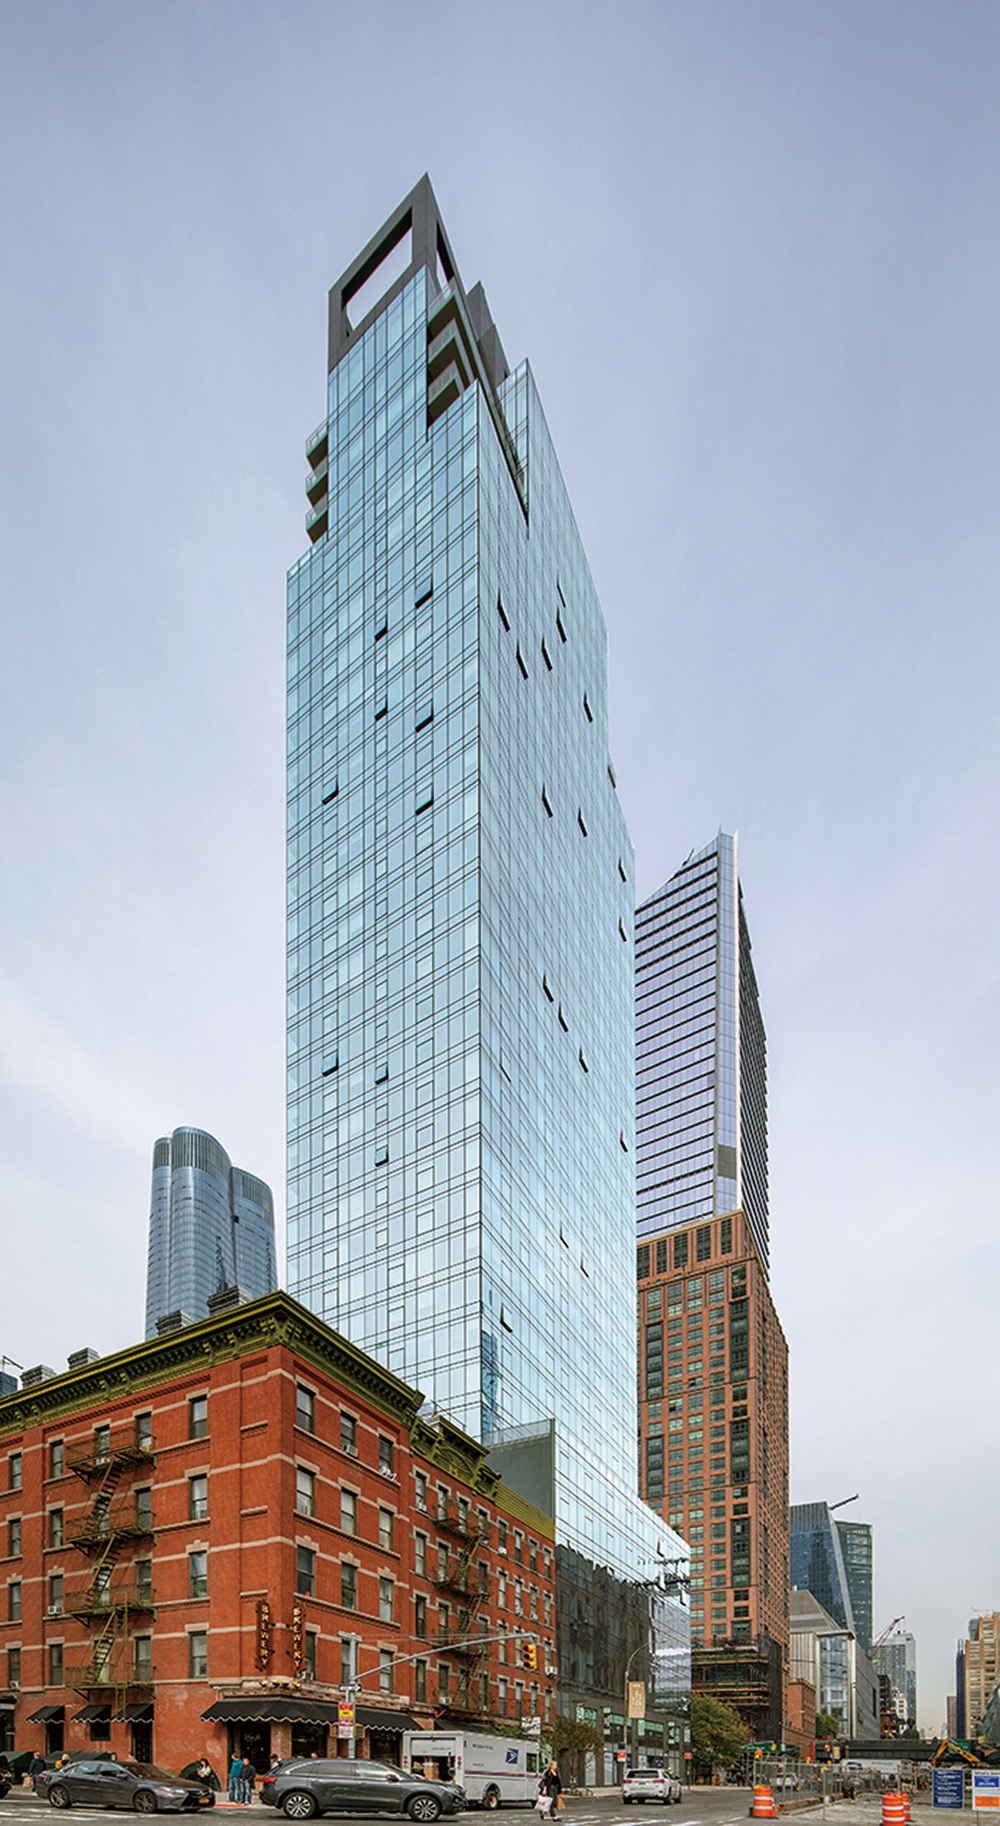 WEST 28TH STREET, NEW YORK CITY